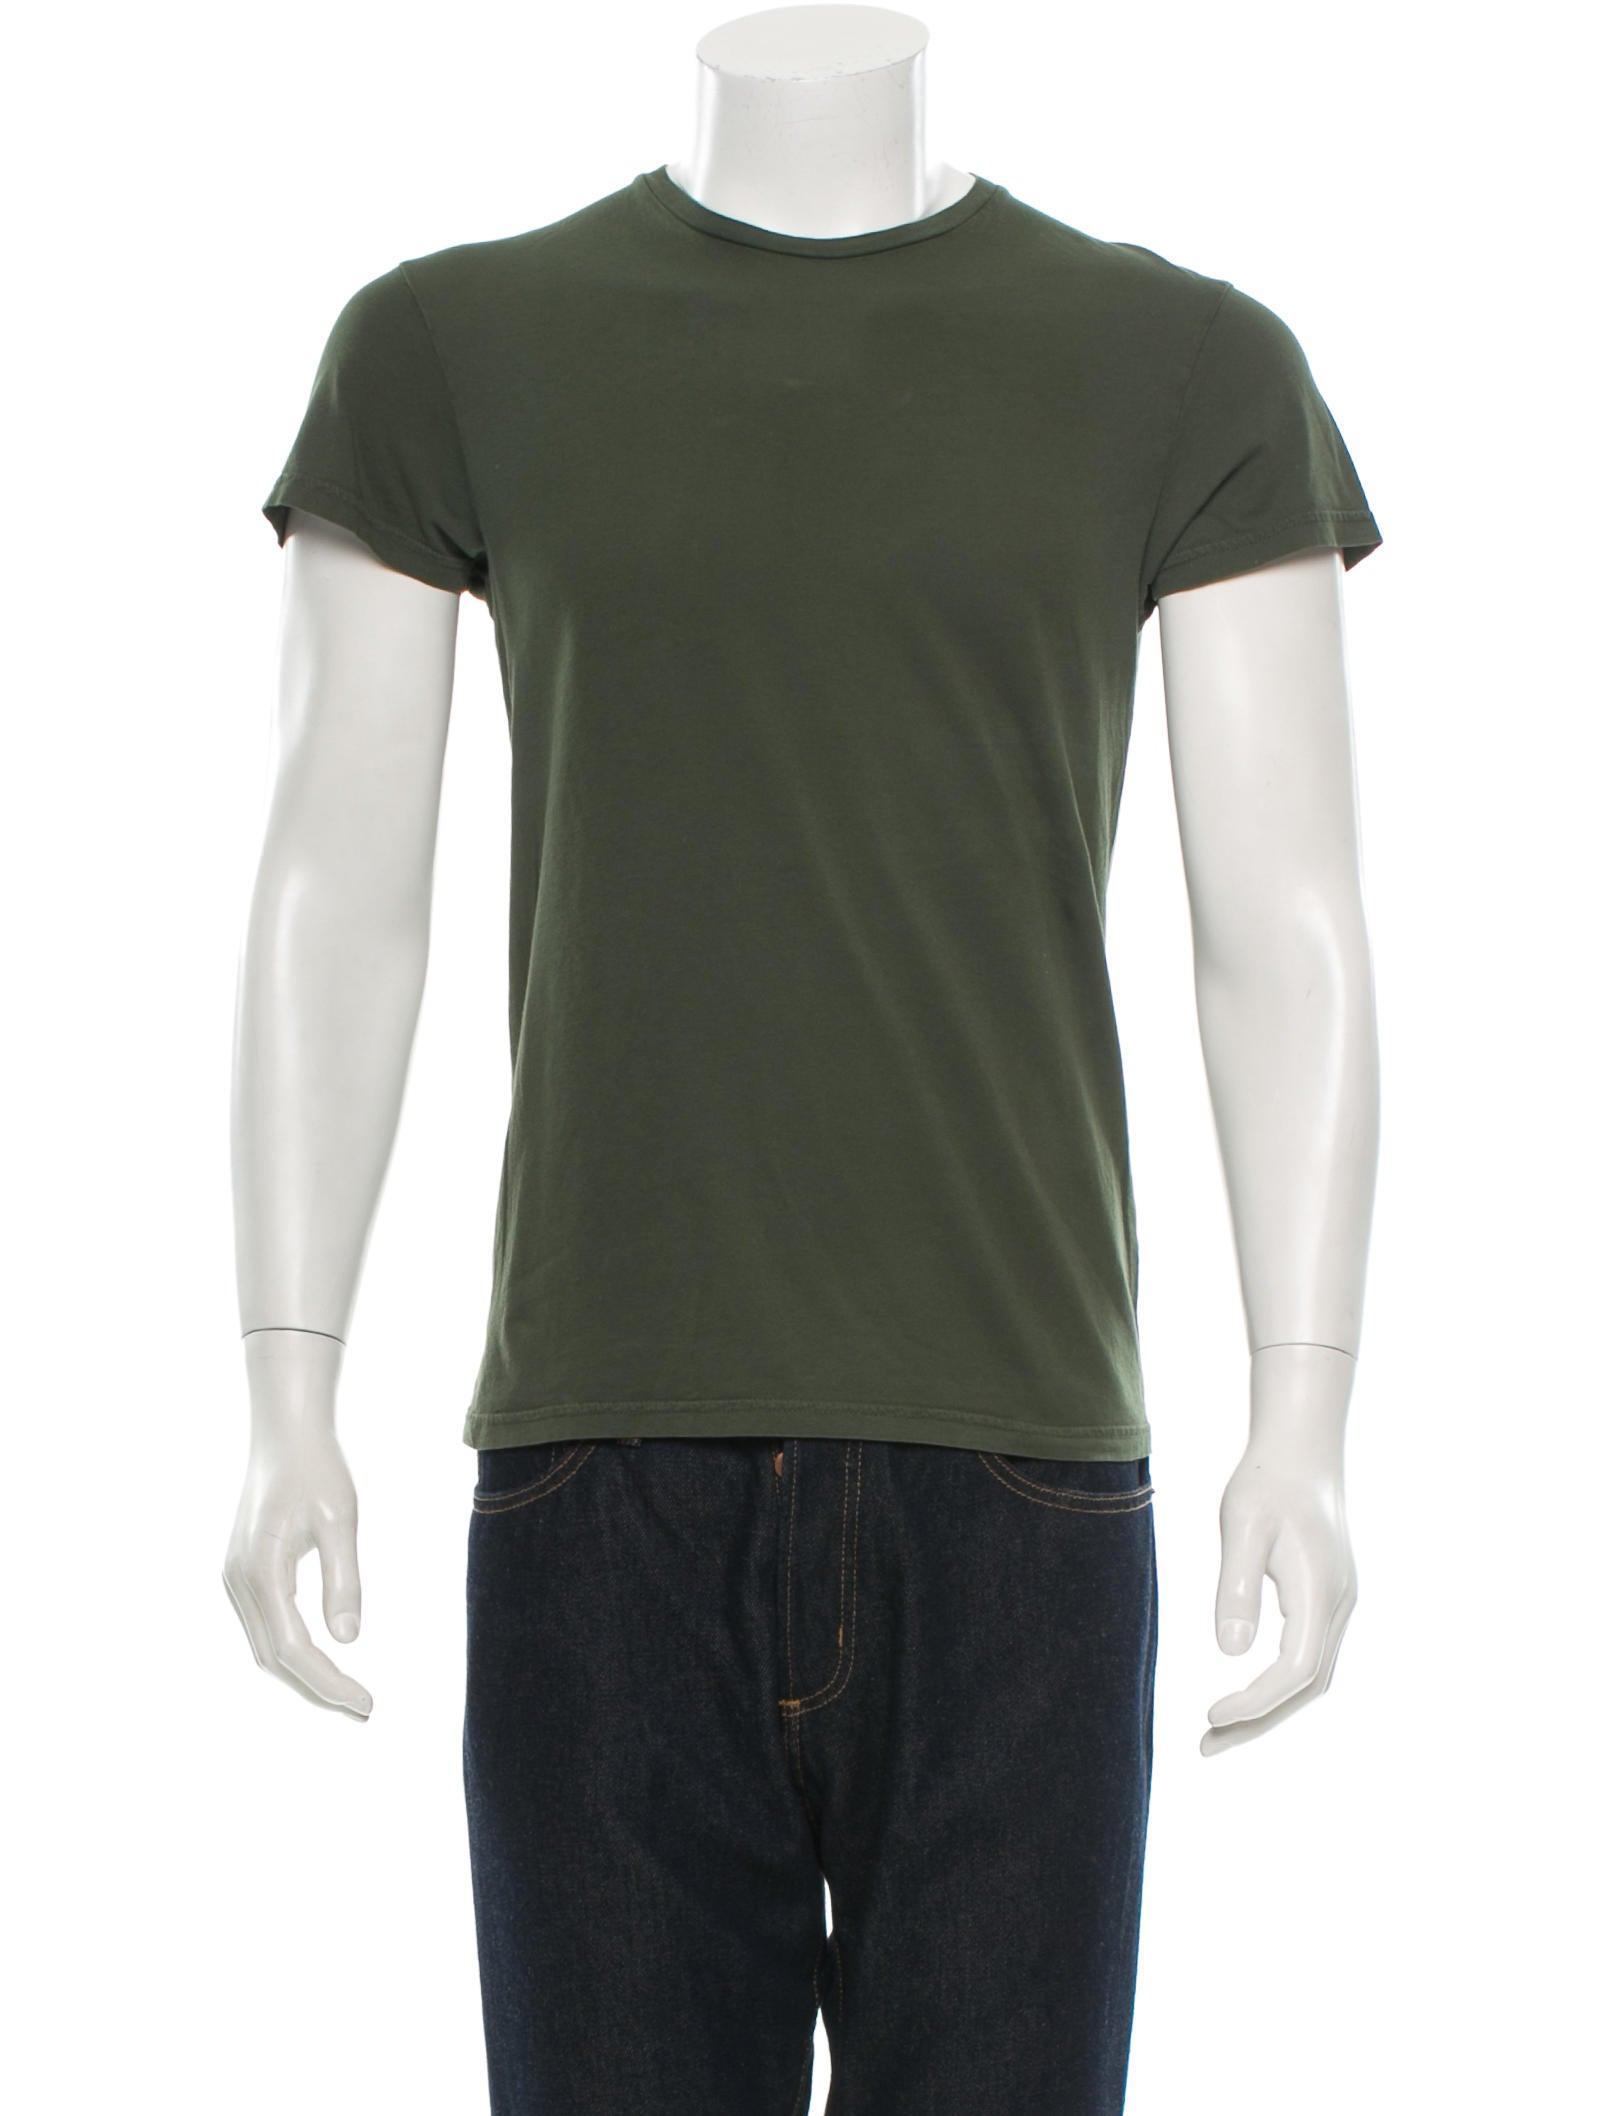 Jil sander t shirt clothing jil26138 the realreal for Jil sander mens shirt